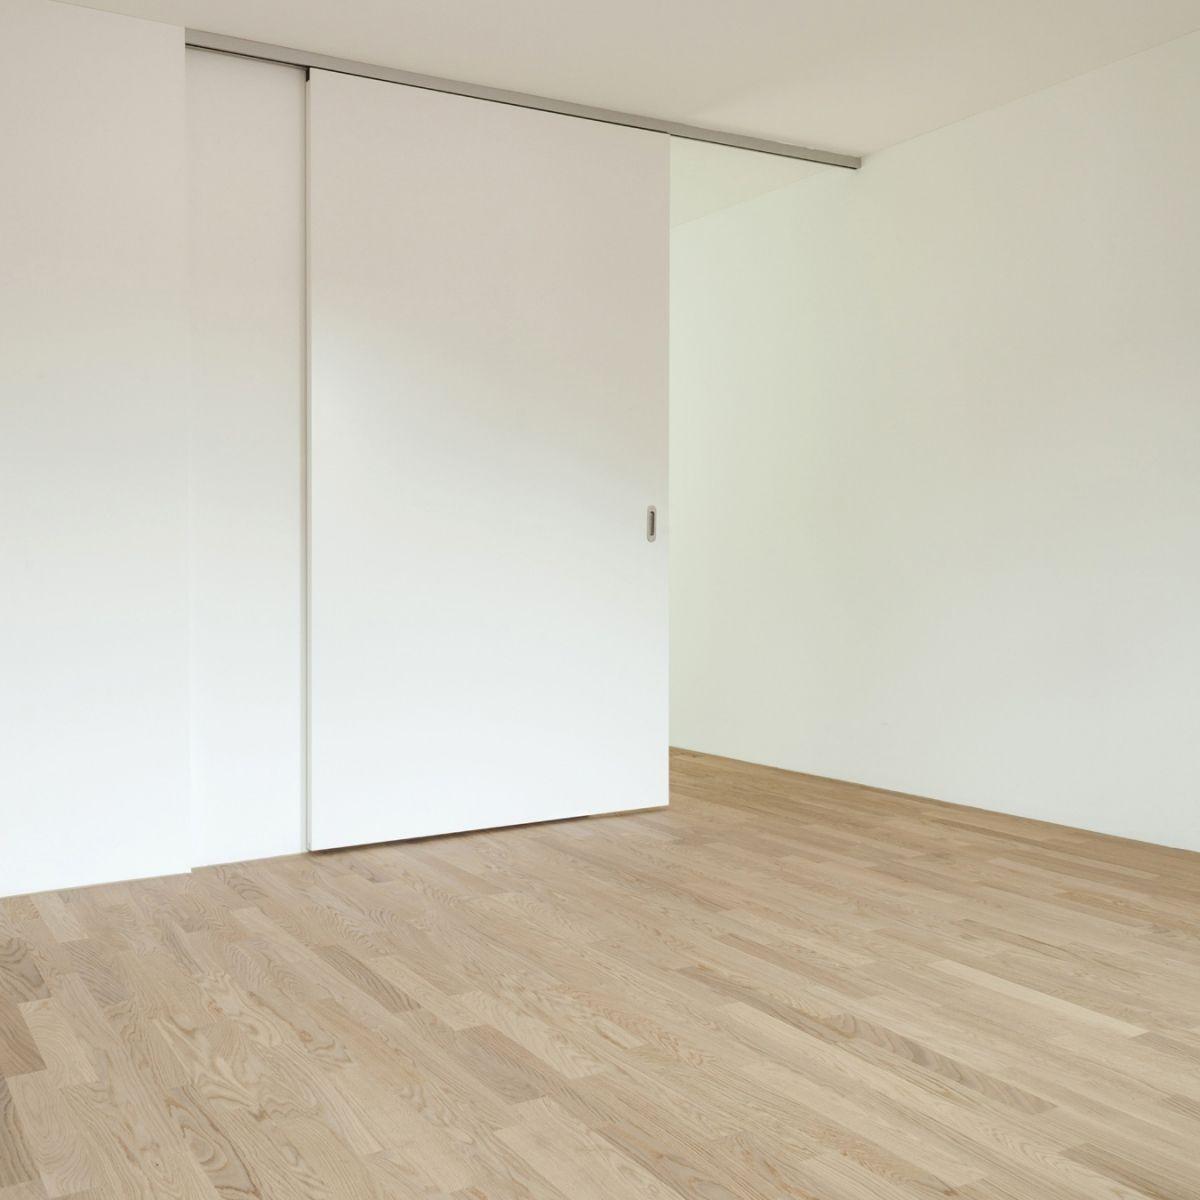 kamerhoge houten schuifdeur house pinterest hausbau t ren und inspiration. Black Bedroom Furniture Sets. Home Design Ideas